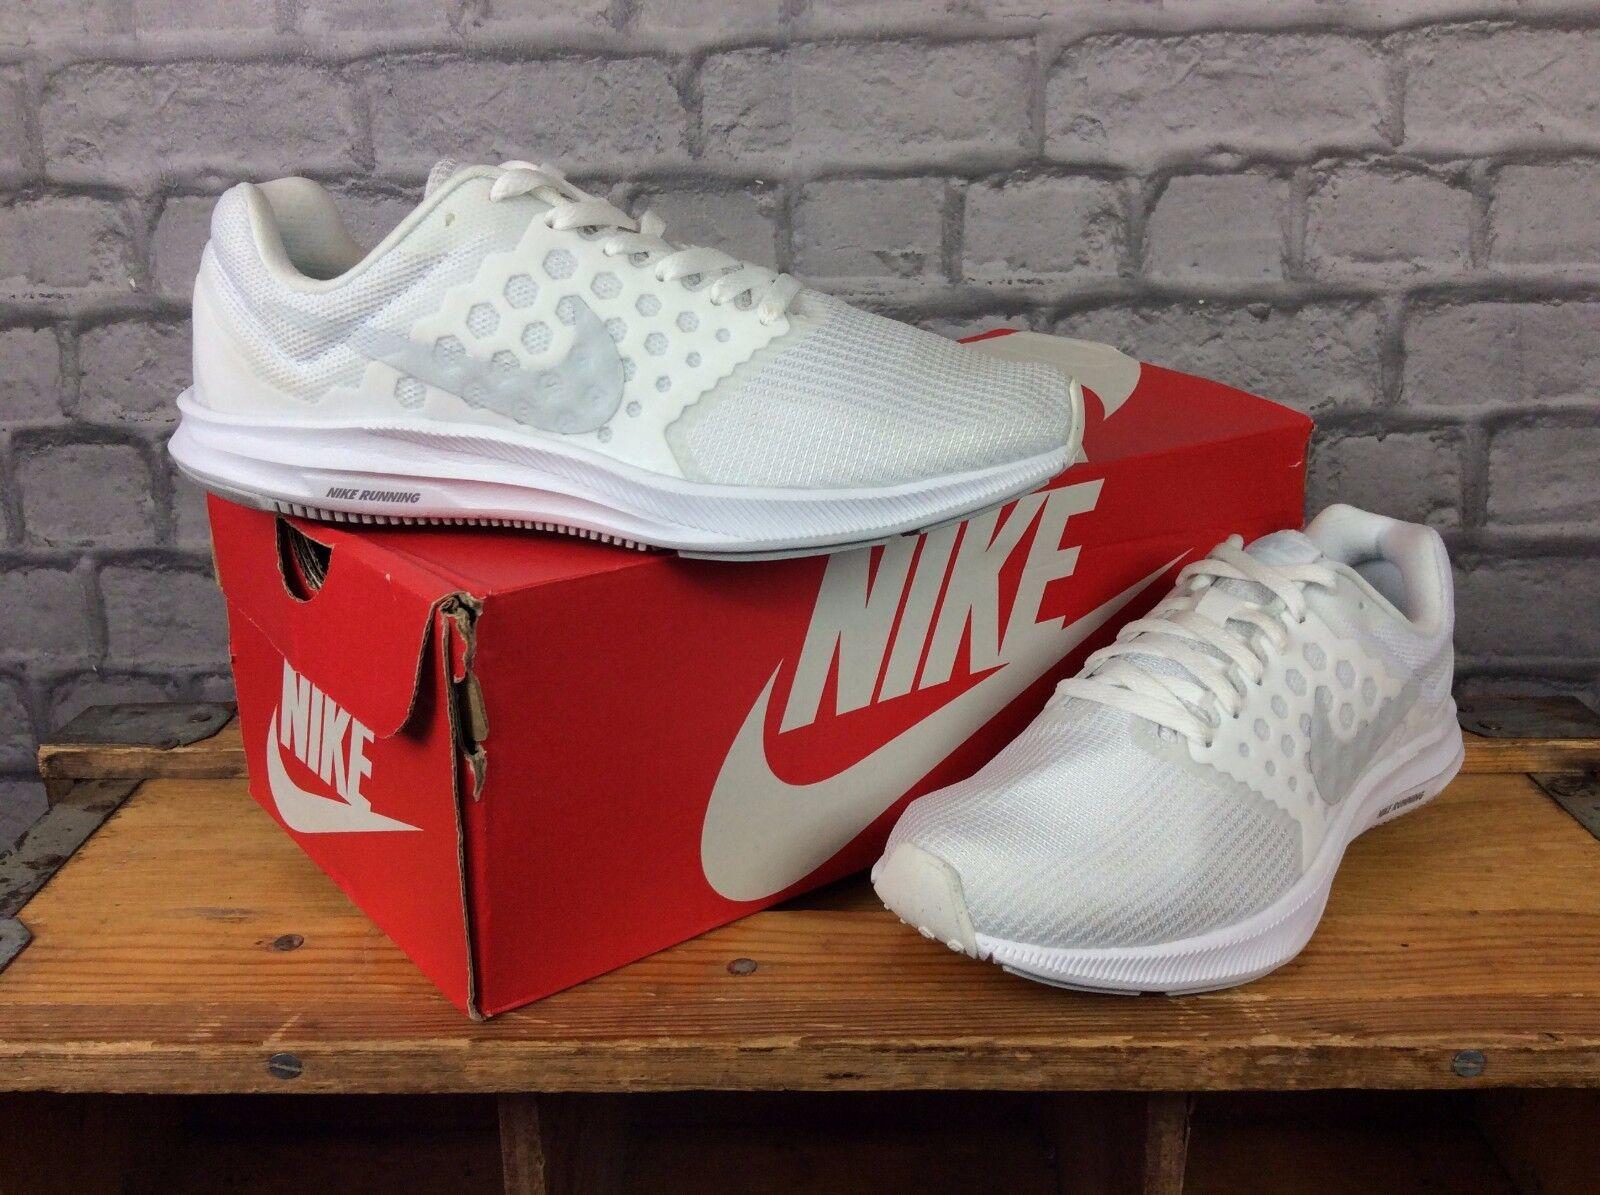 Nike Femmes uk 3 eu 36 Blanc Downshifter Downshifter Blanc 7 Baskets 60b67e